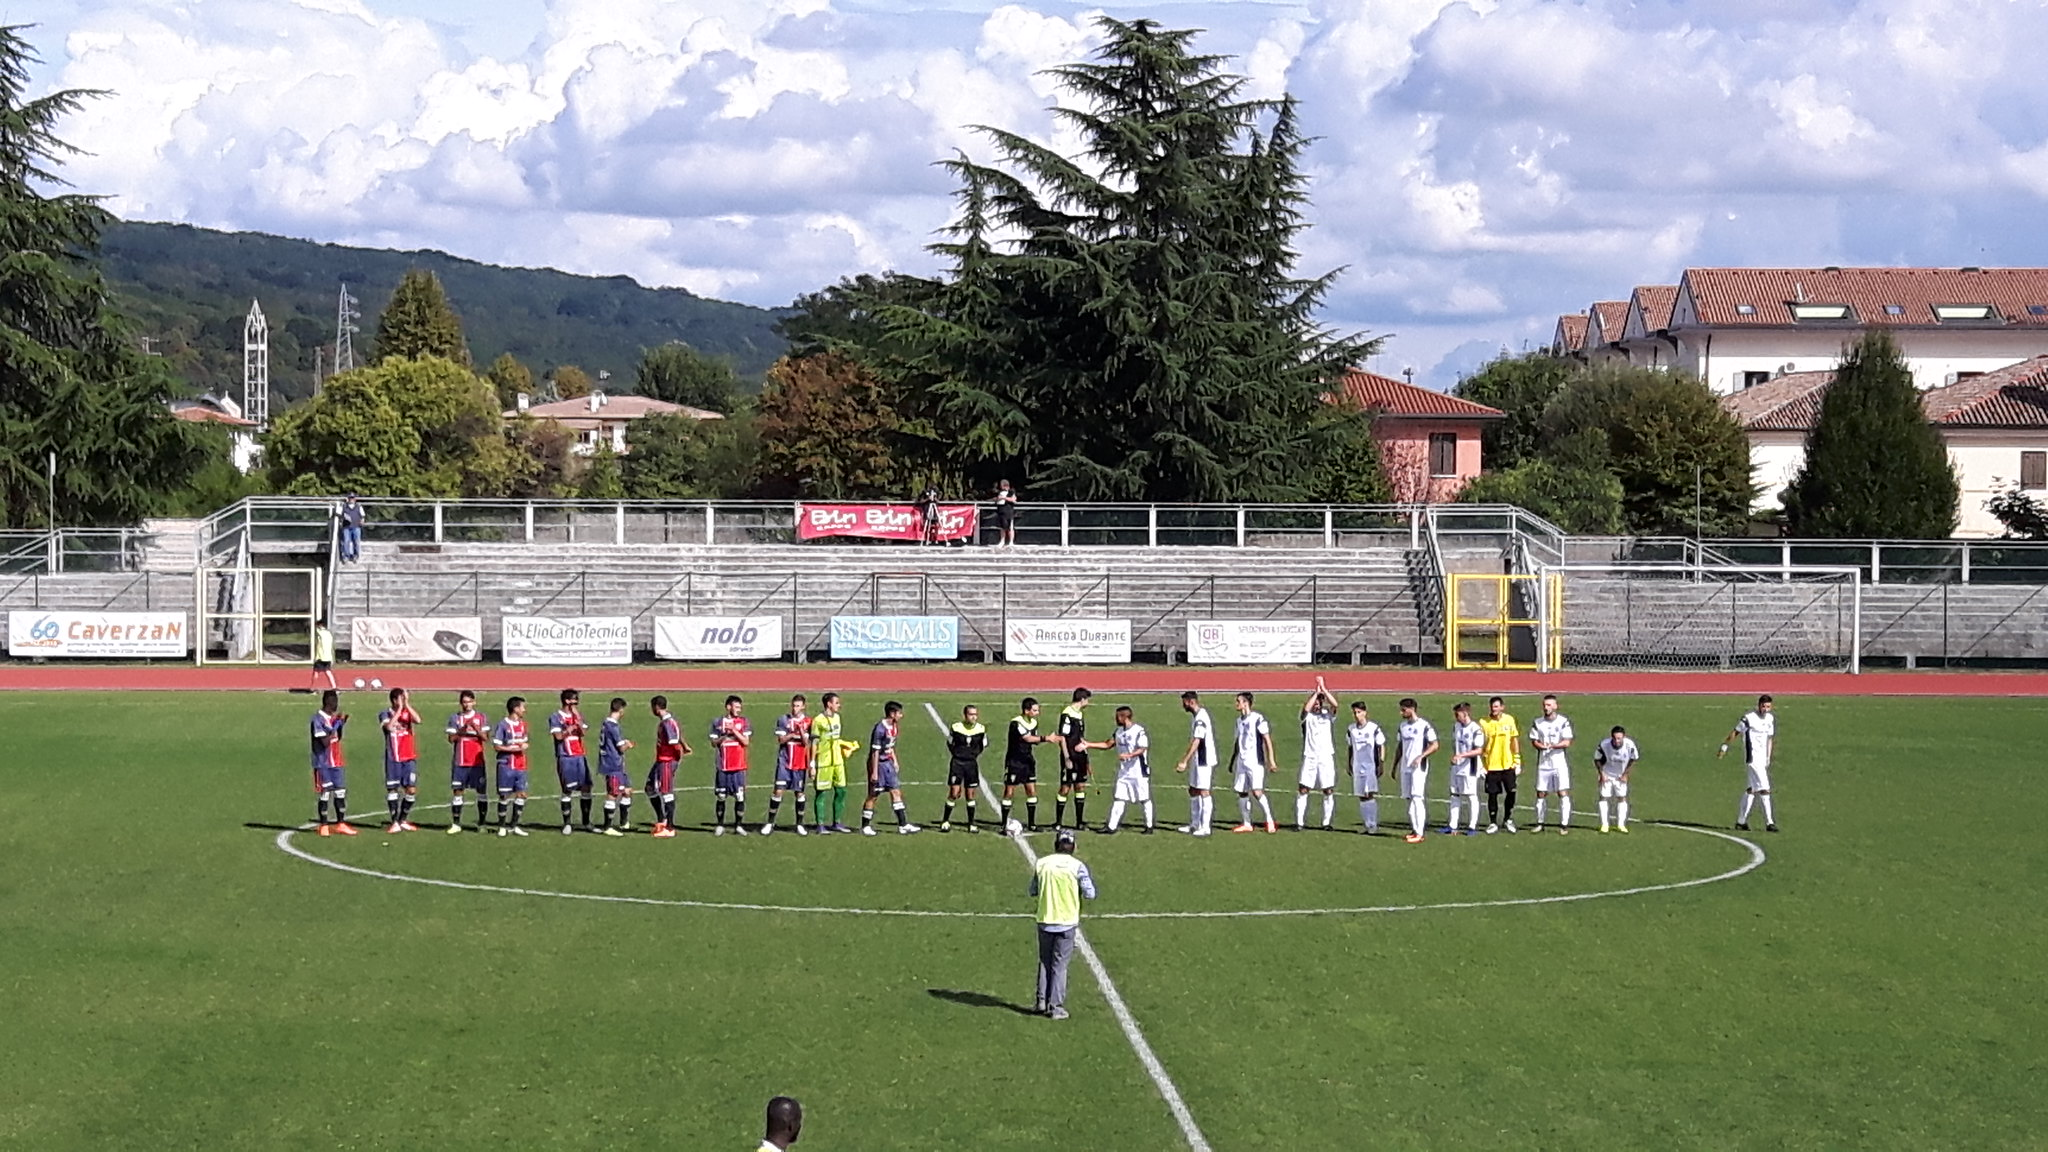 Montebelluna- Virtus Verona 1-2, primo sorriso in trasferta!